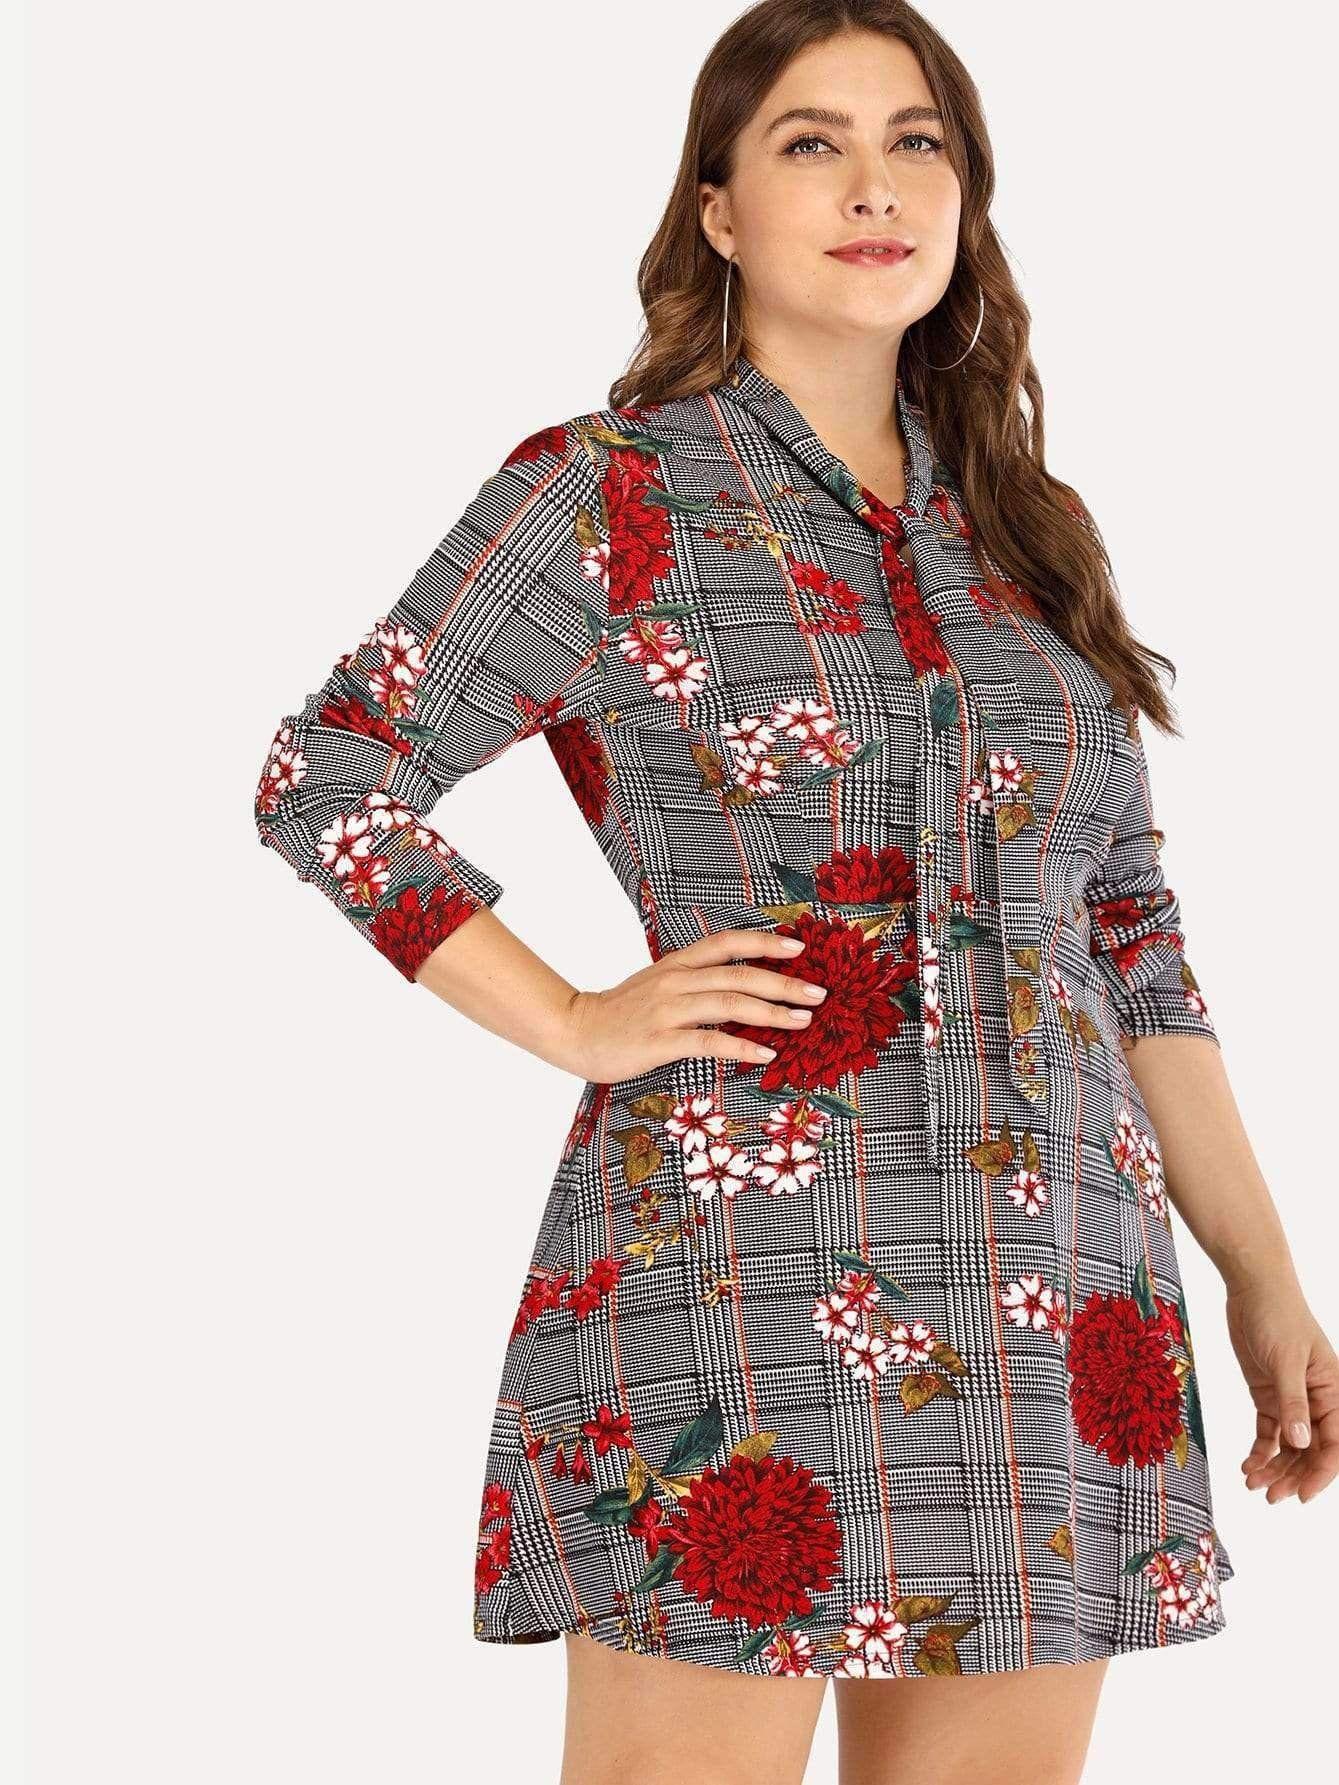 b1e694ba58b Floral Embroidered Dress   Plus Size Collection   Dresses, Plaid ...